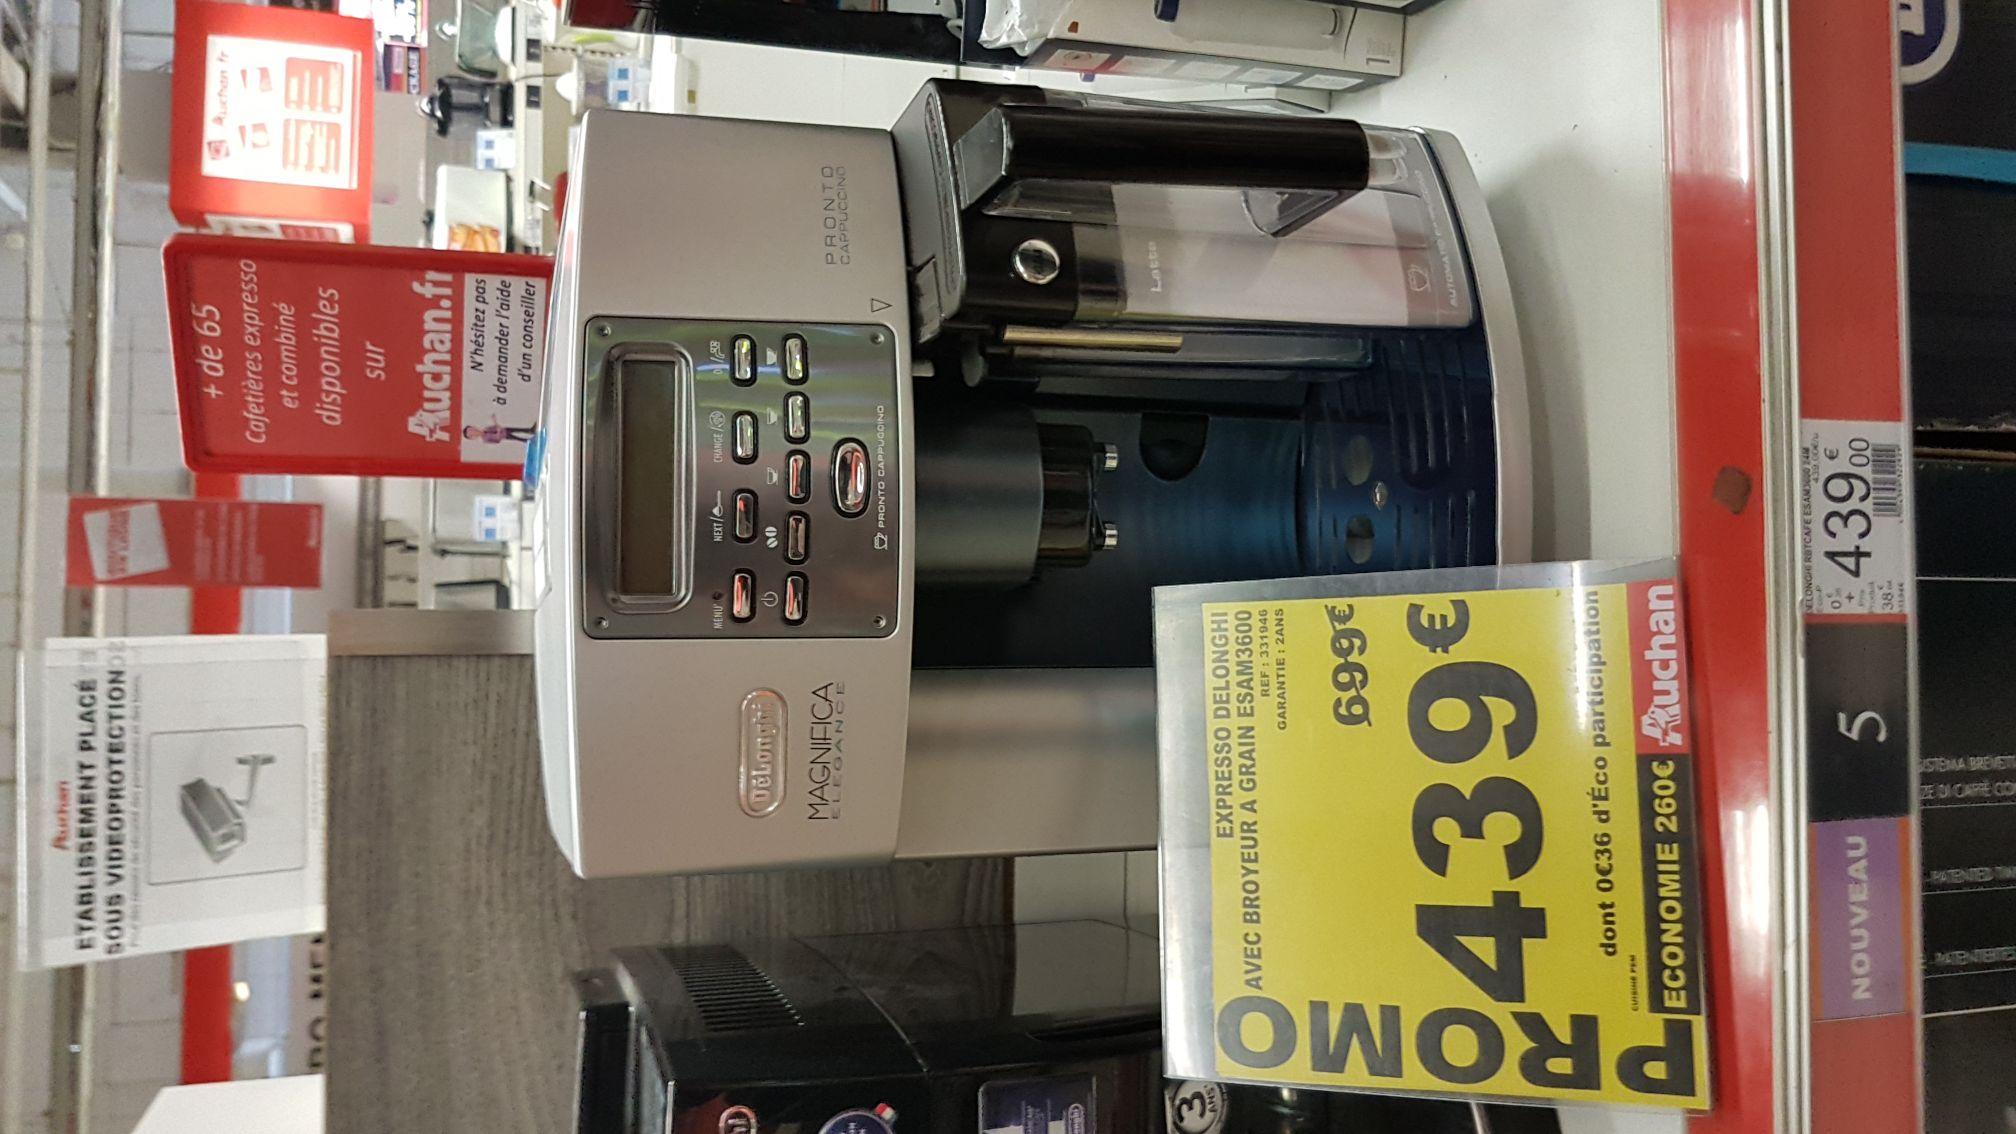 Machine à Expresso Delonghi Magnifica Elegance ESAM3600 - Auchan bagnolet (93)